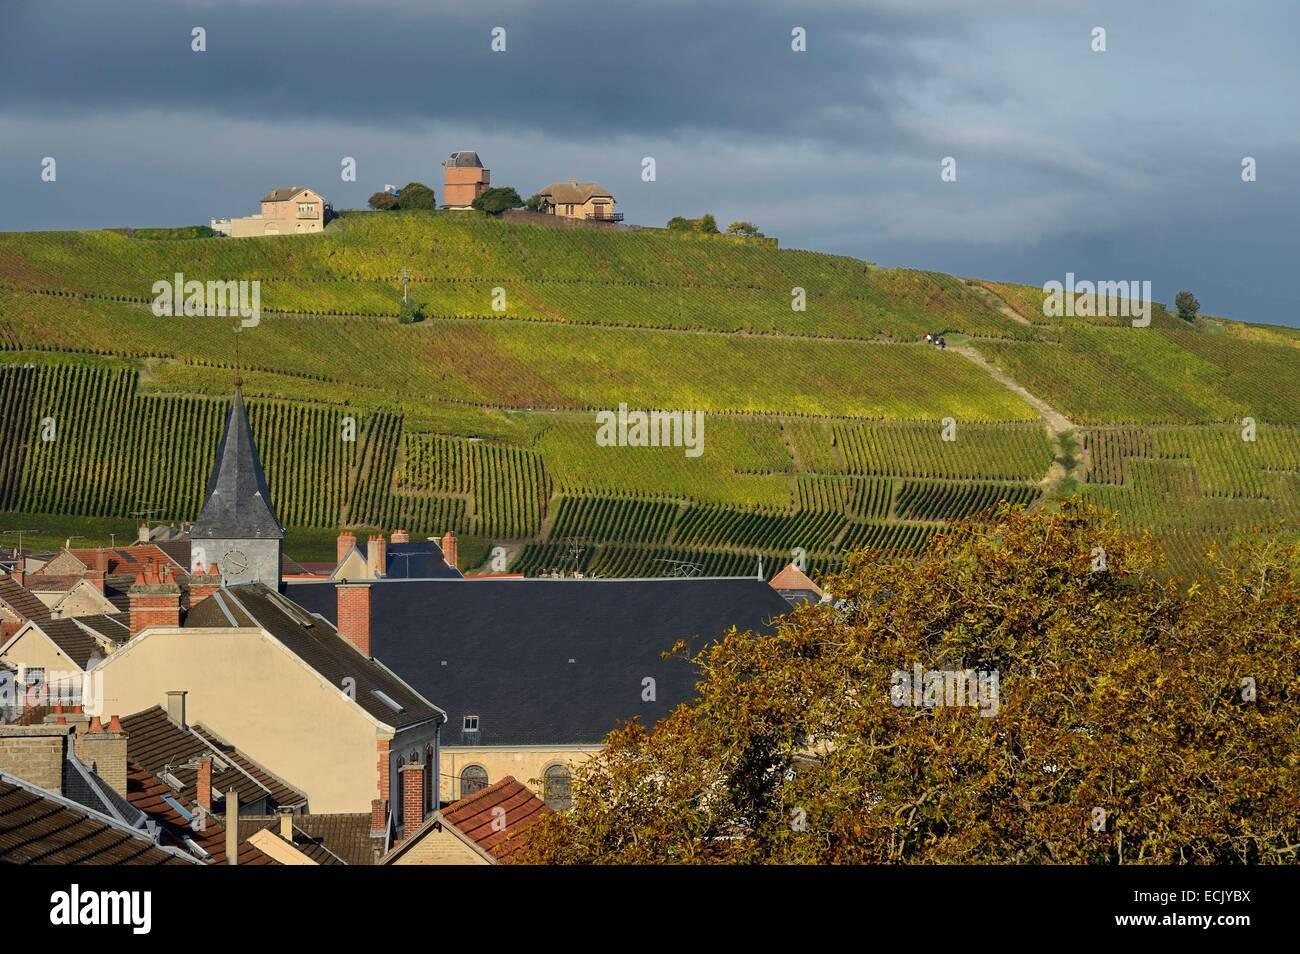 Francia, Marne, Parc naturel de la Montagne de Reims (parco naturale delle Montagne de Reims), Verzenay, vigneti Immagini Stock